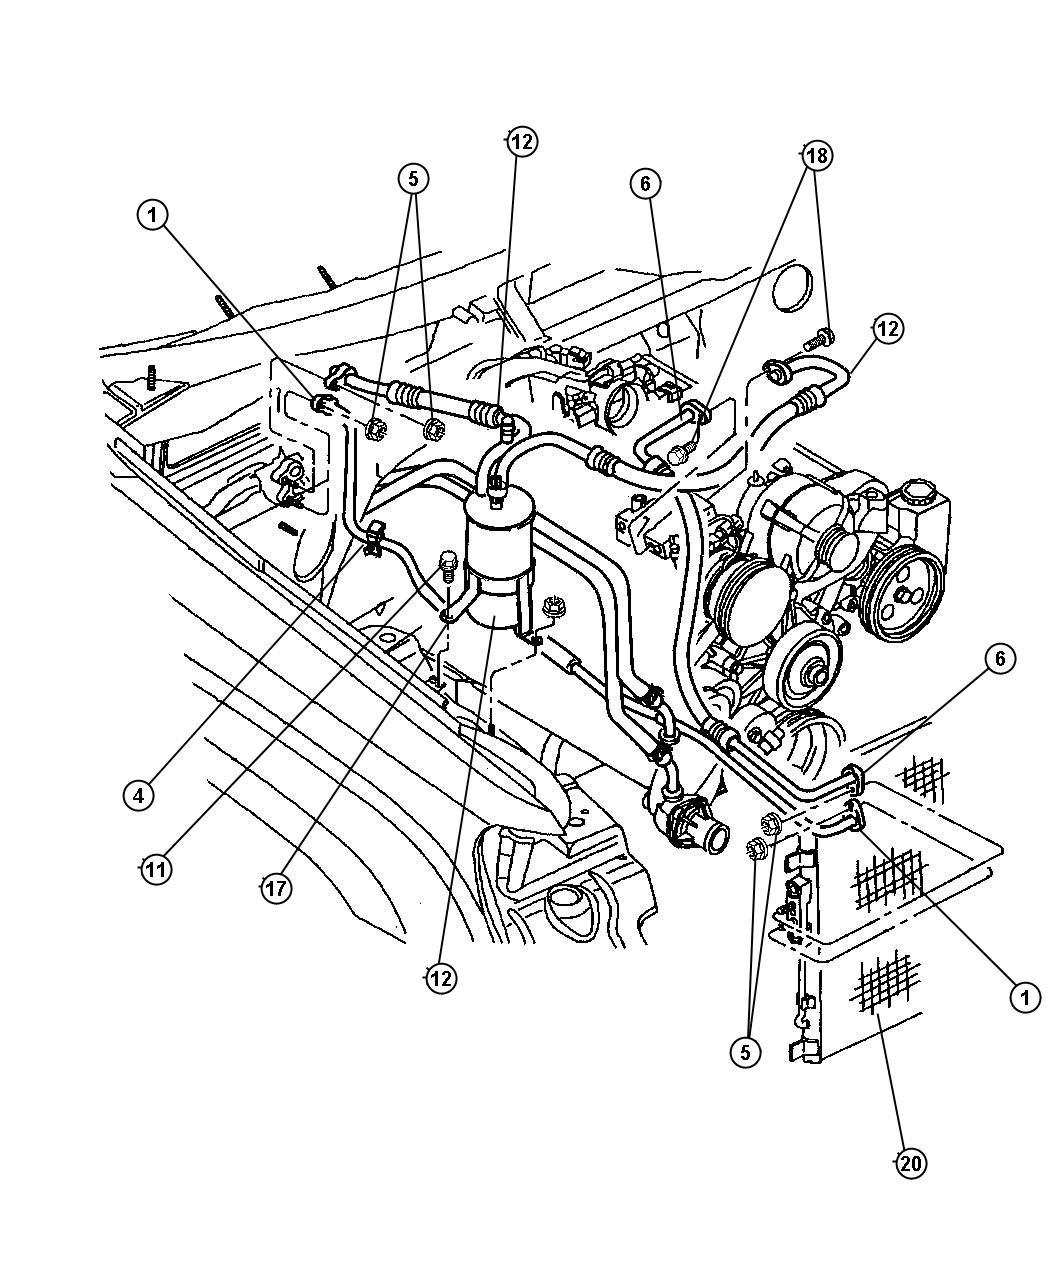 2000 Jeep O ring. A/c liquid line. 1/2 inch stat-o-seal